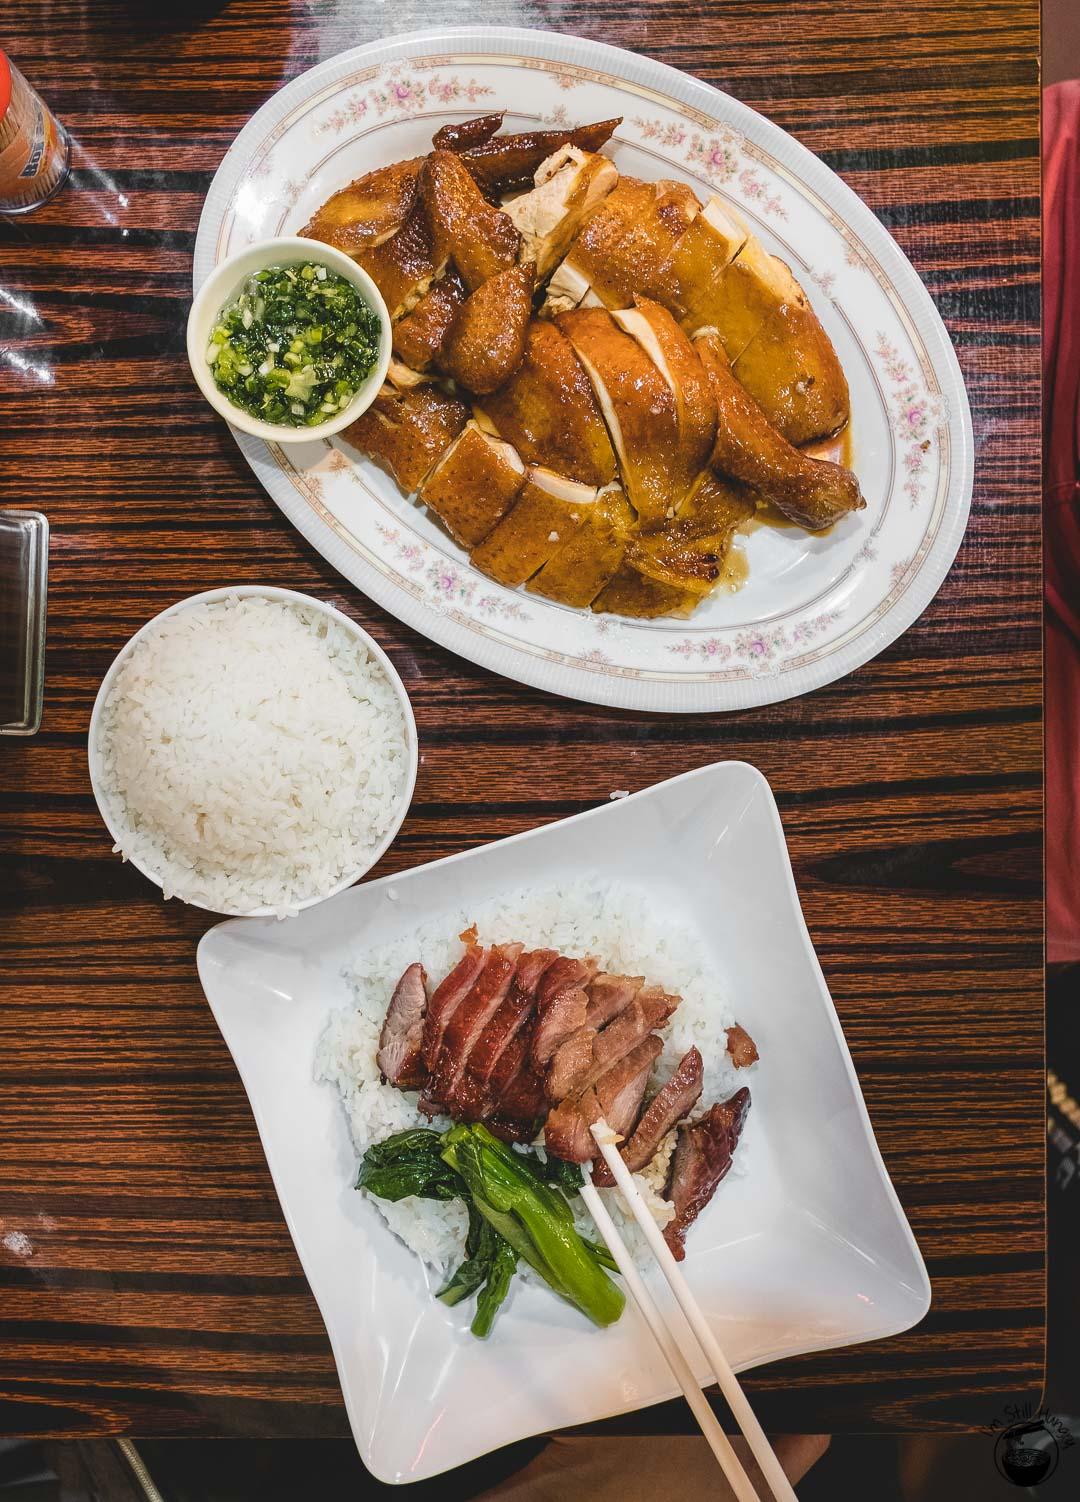 Kwan Yu Roast Meat Hong Kong Roasted soy sauce chicken, char siu rice